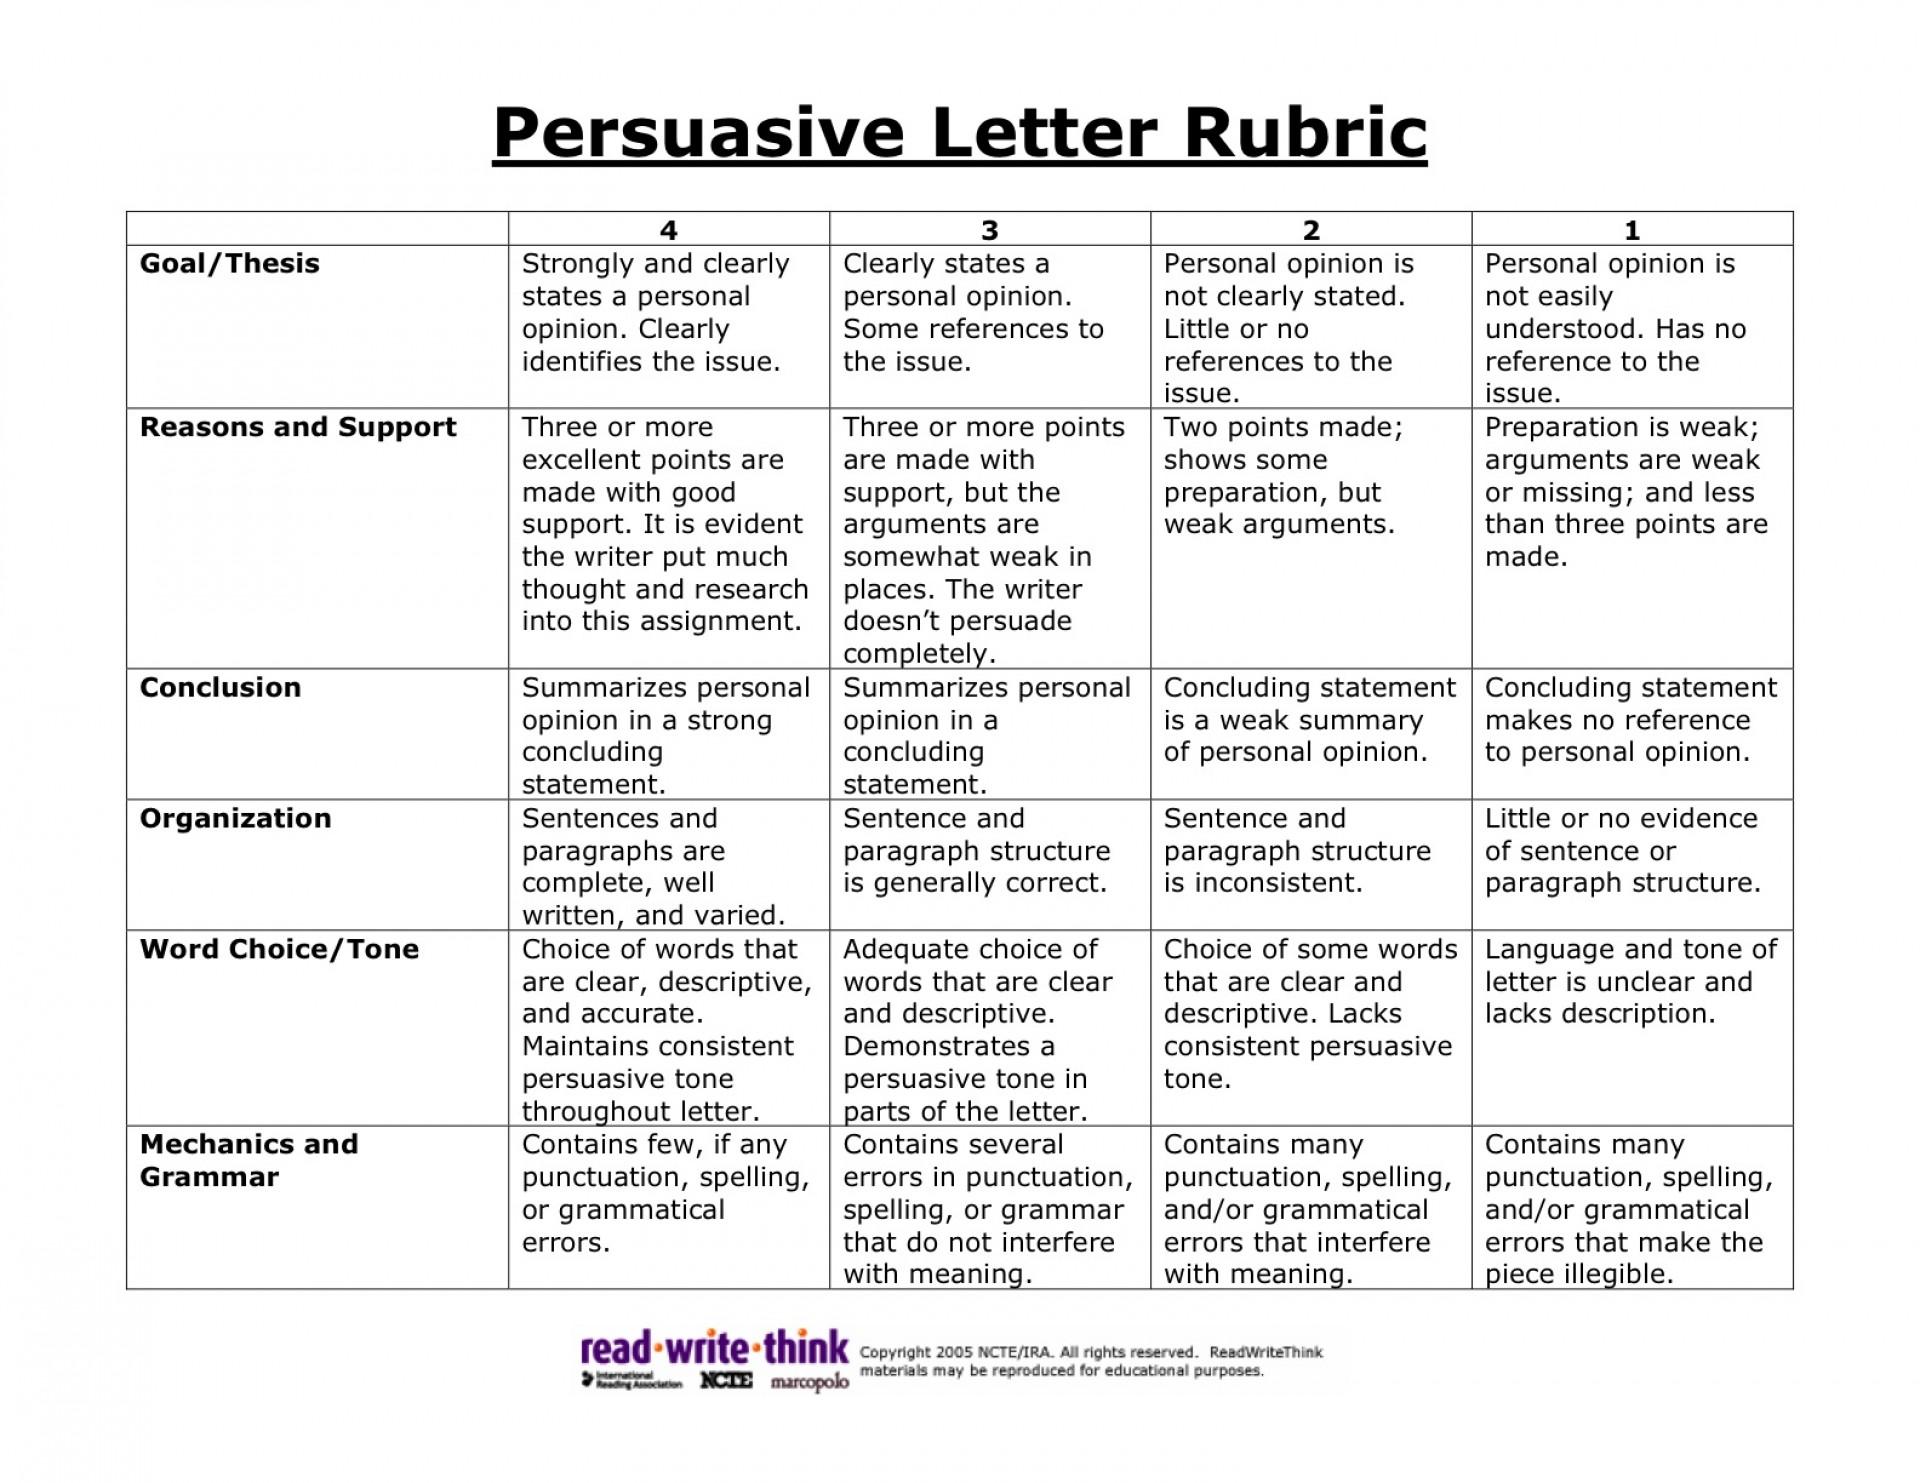 012 Persuasive2brubric Essay Example 6th Grade Surprising Topics Reflective Narrative Writing Prompts Science 1920